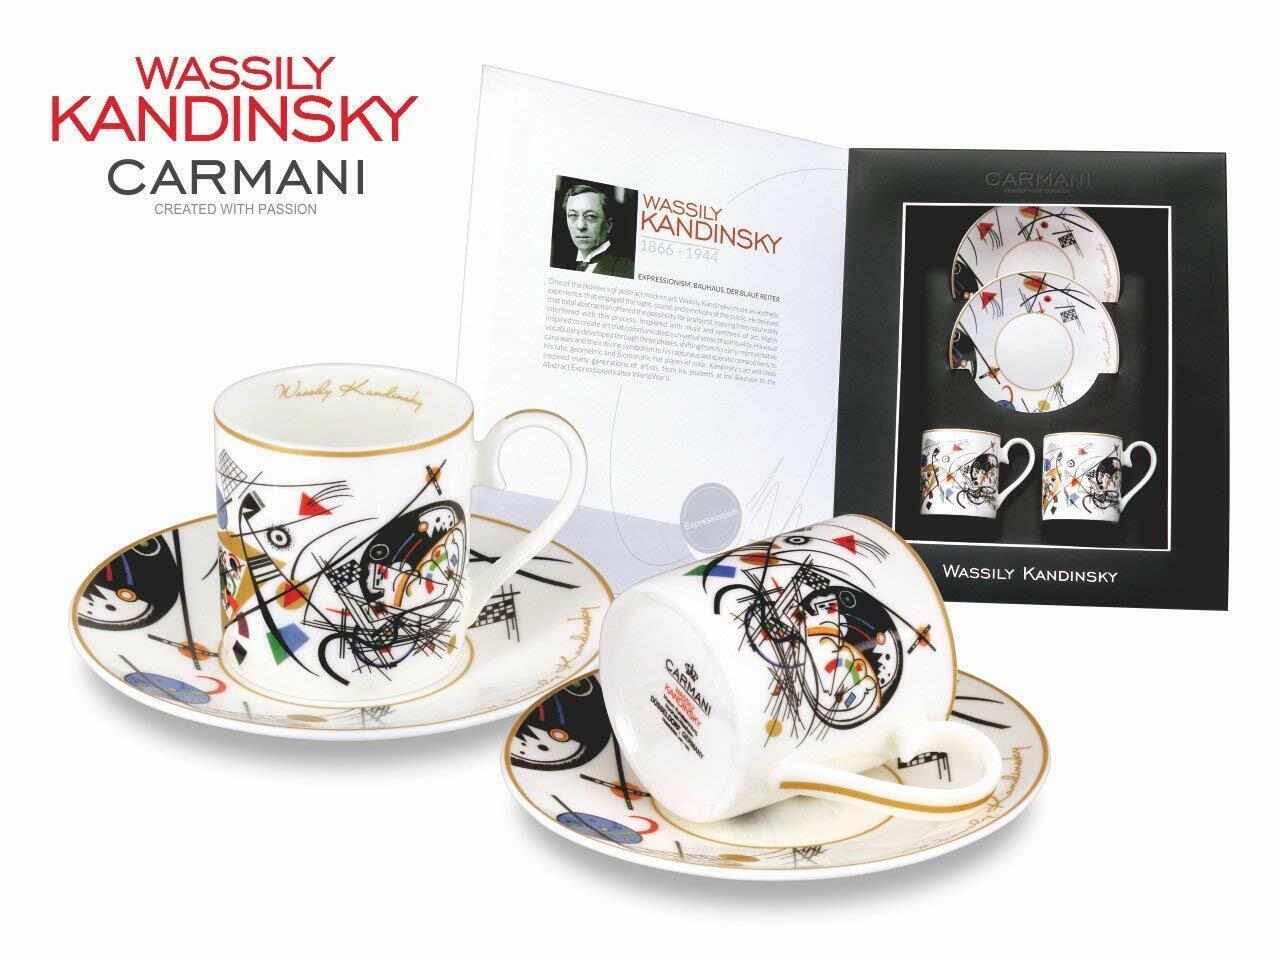 Carmani peintres 4-pc  animée aquarelle  Espresso Set, Kandinsky porcelaine